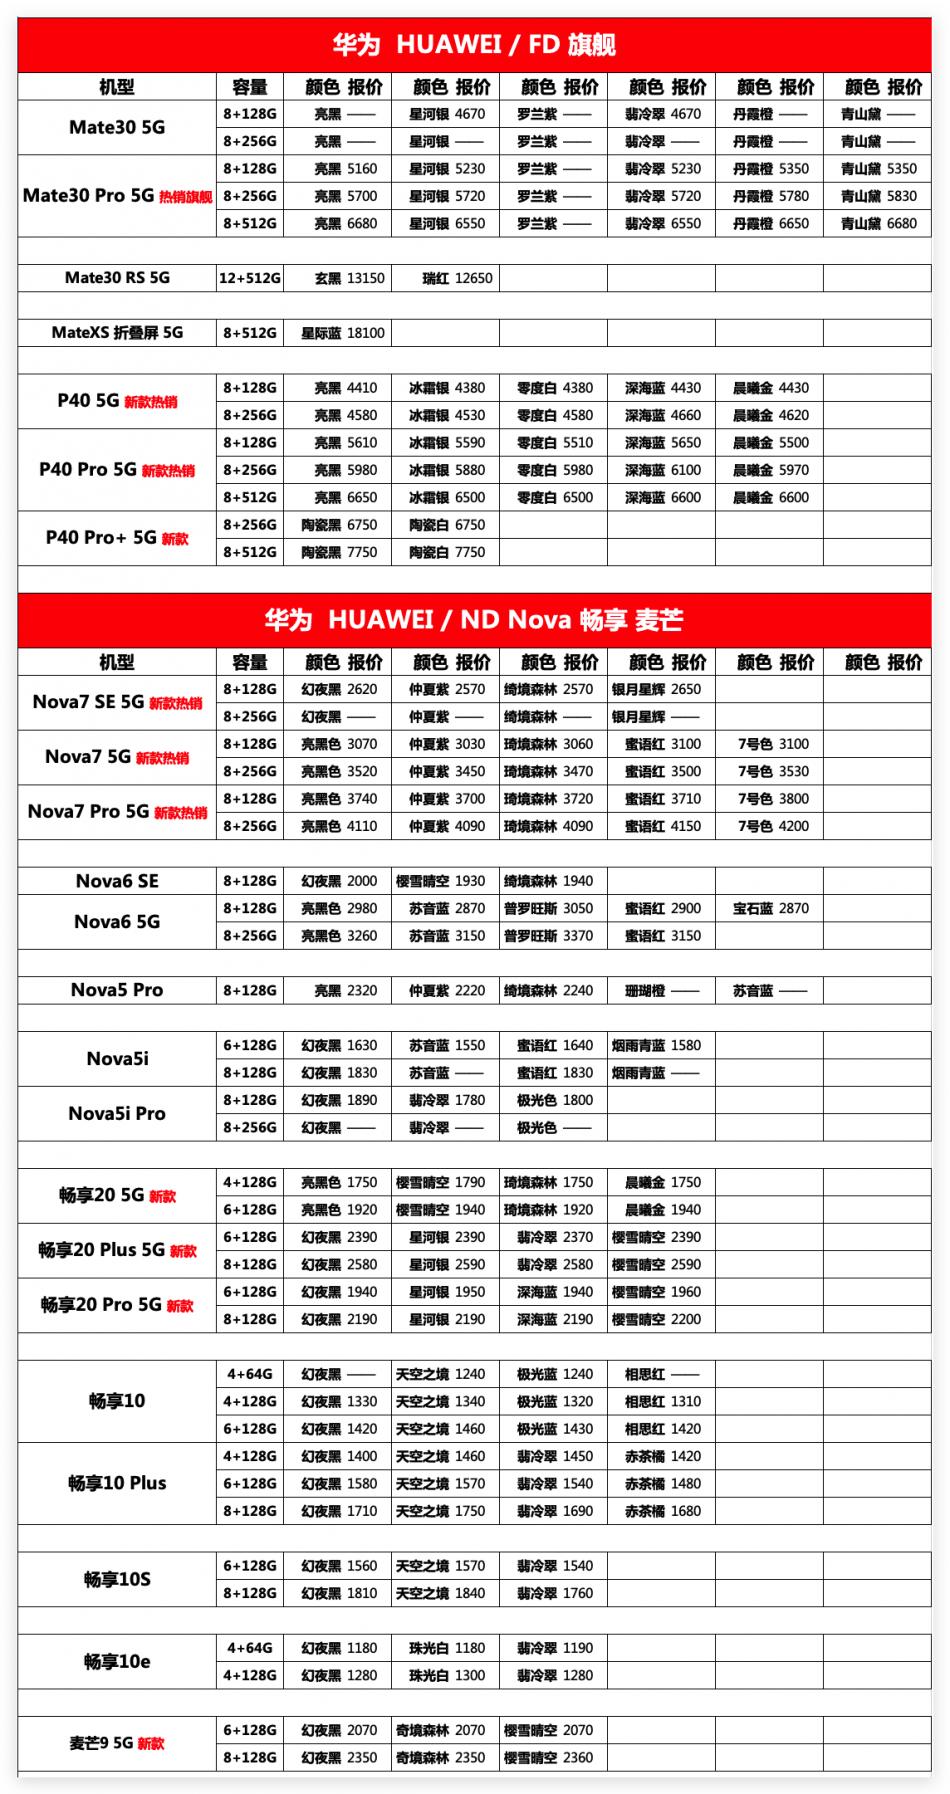 Xnip2020-10-24_15-14-09.png